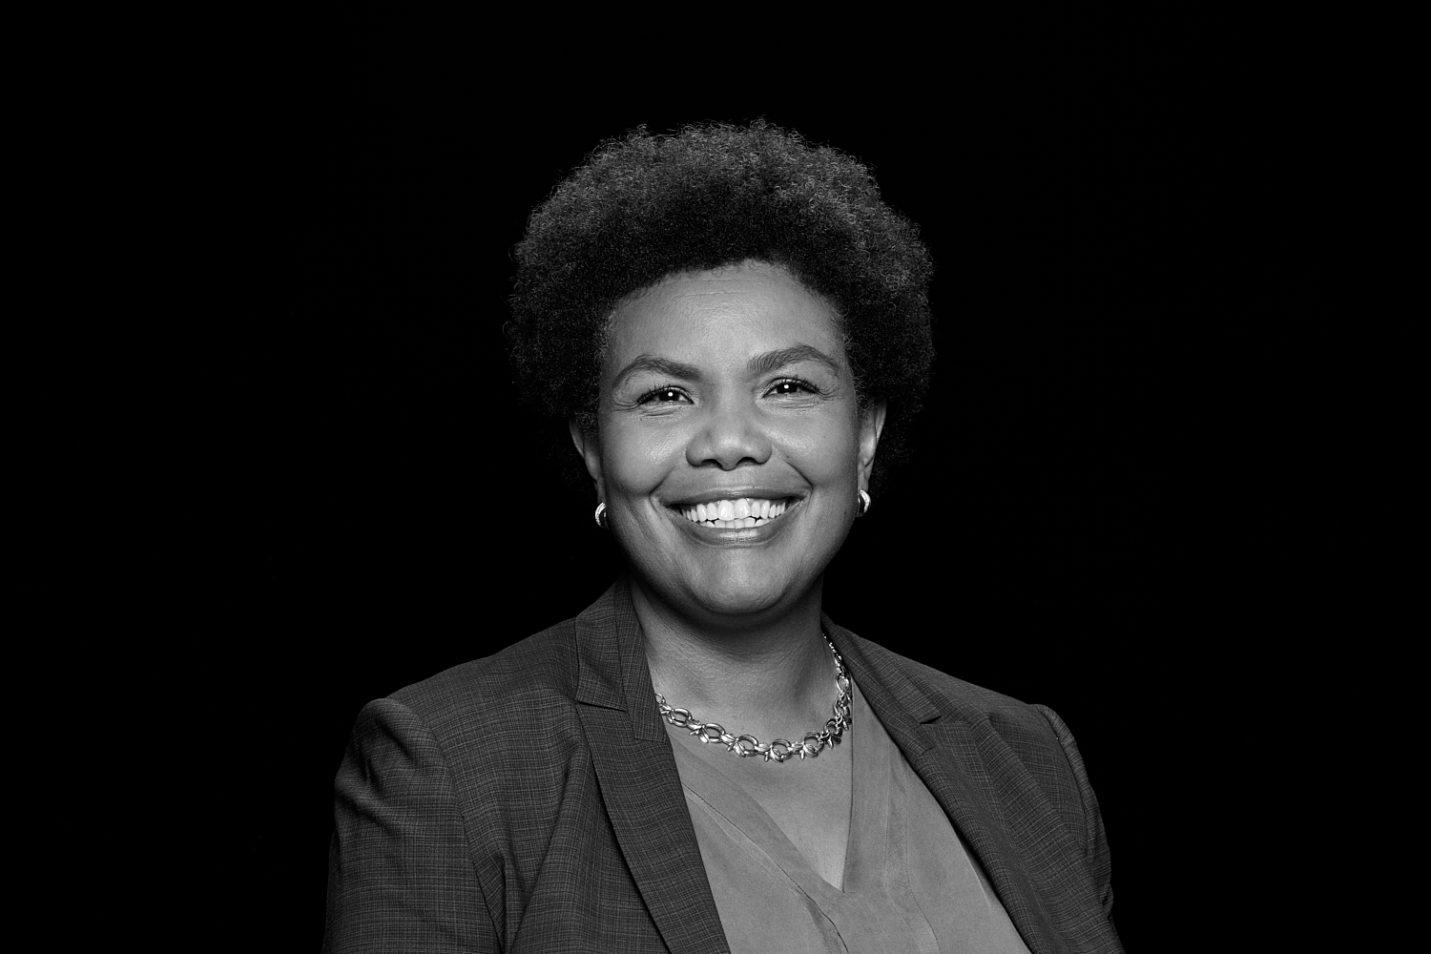 Nova Bus welcomes Mylène Tassy as Vice President of Sales and Marketing